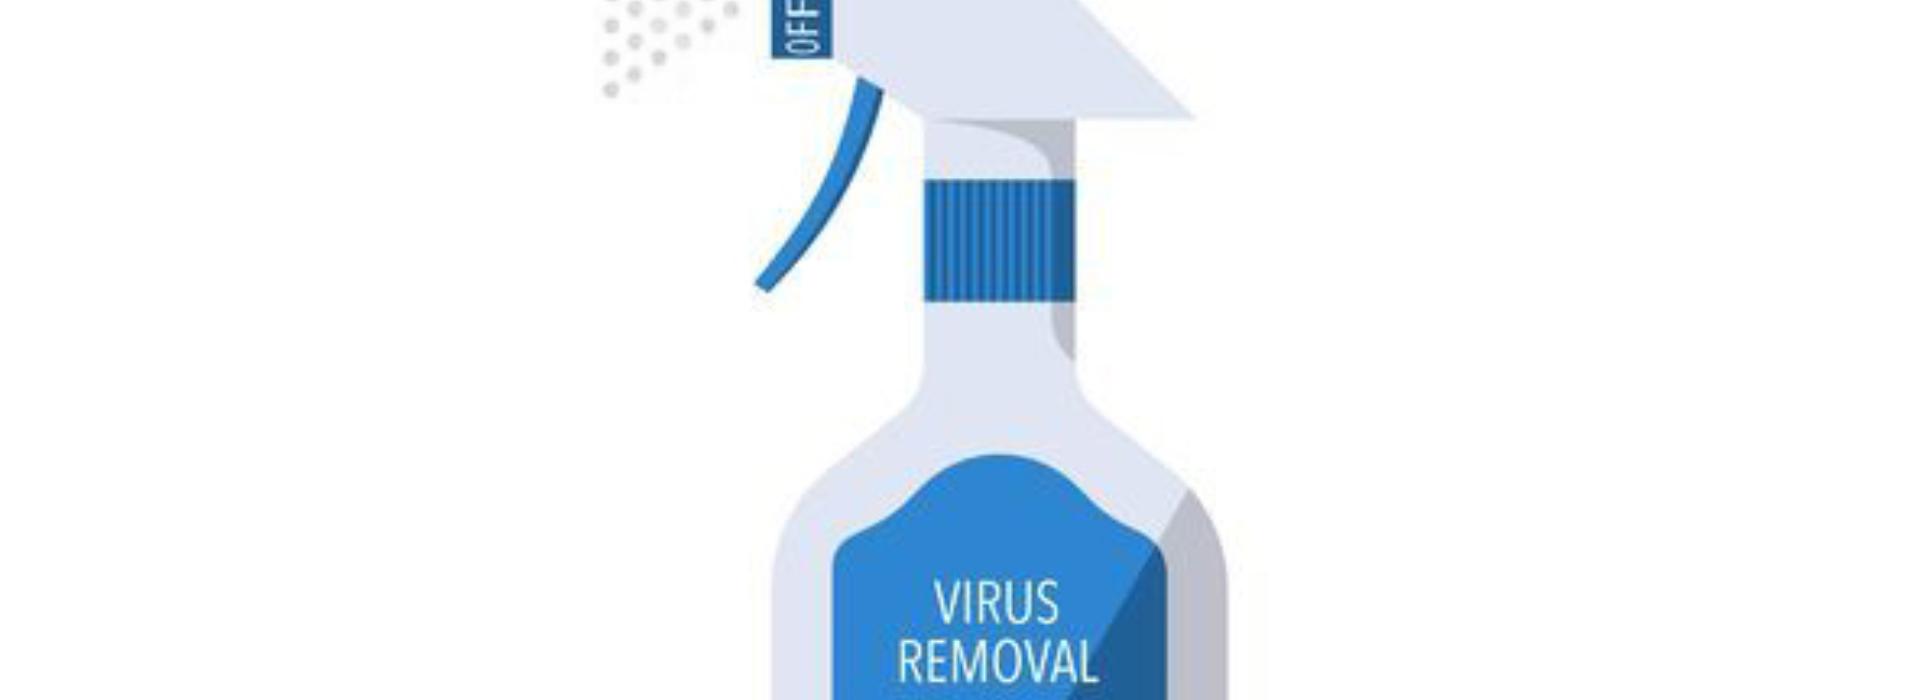 Virus removal2